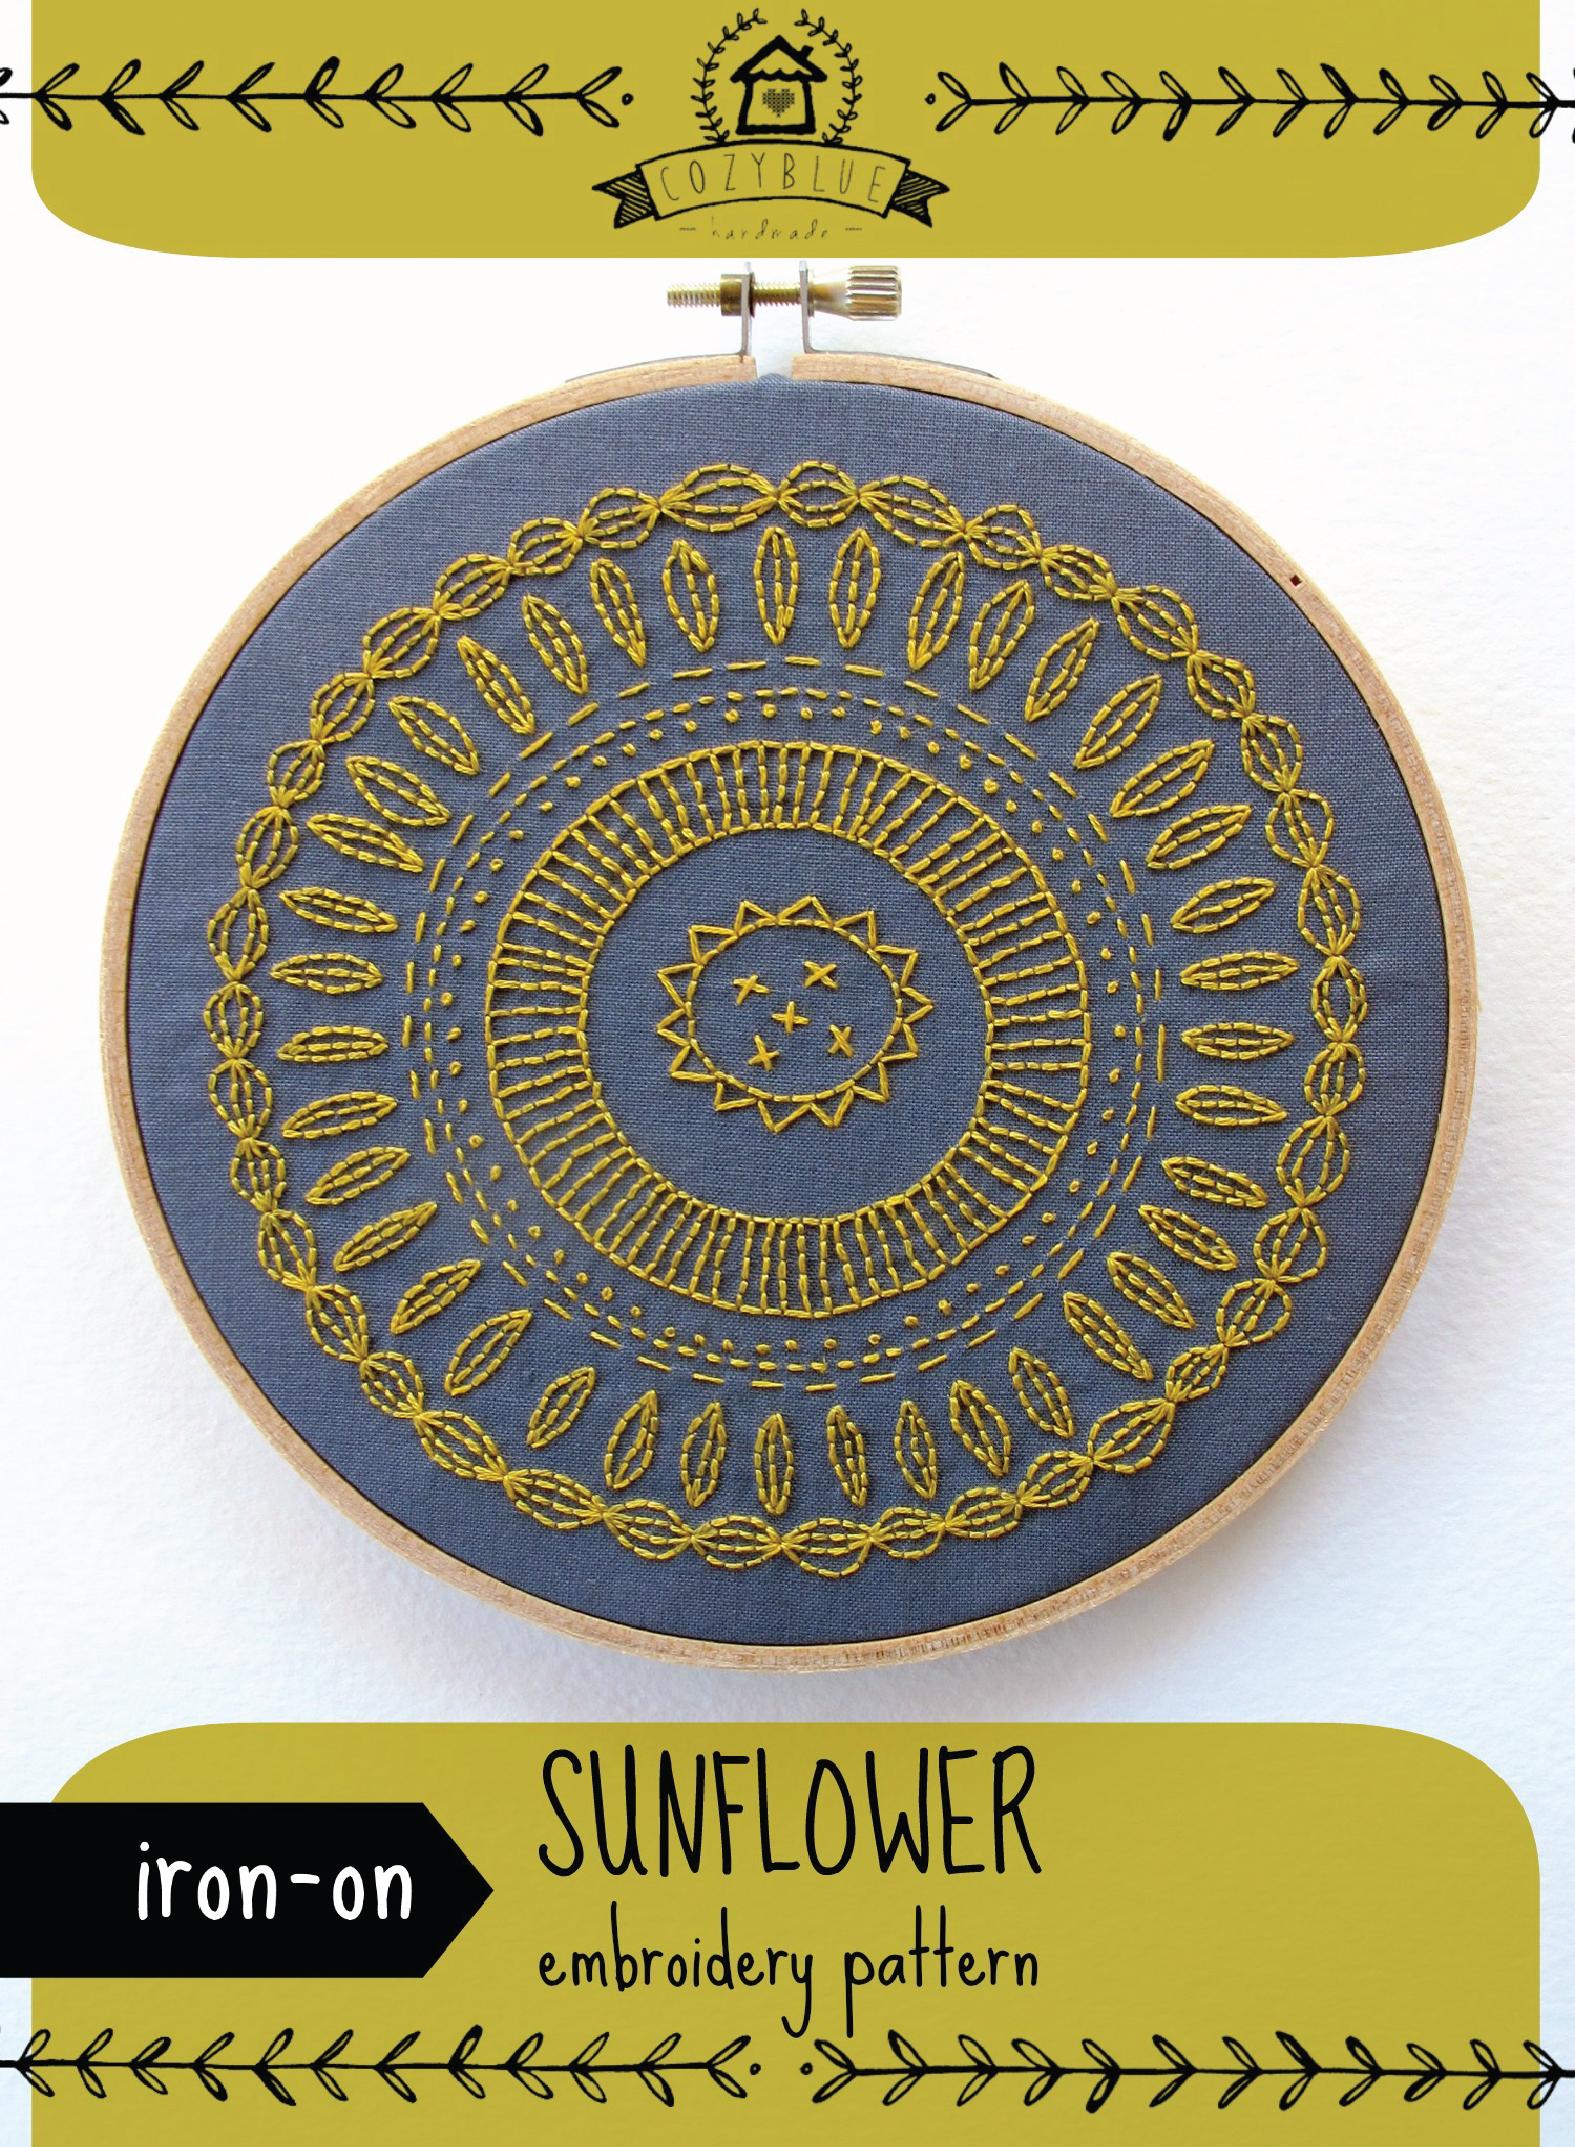 sunflowercard1bleed.jpg